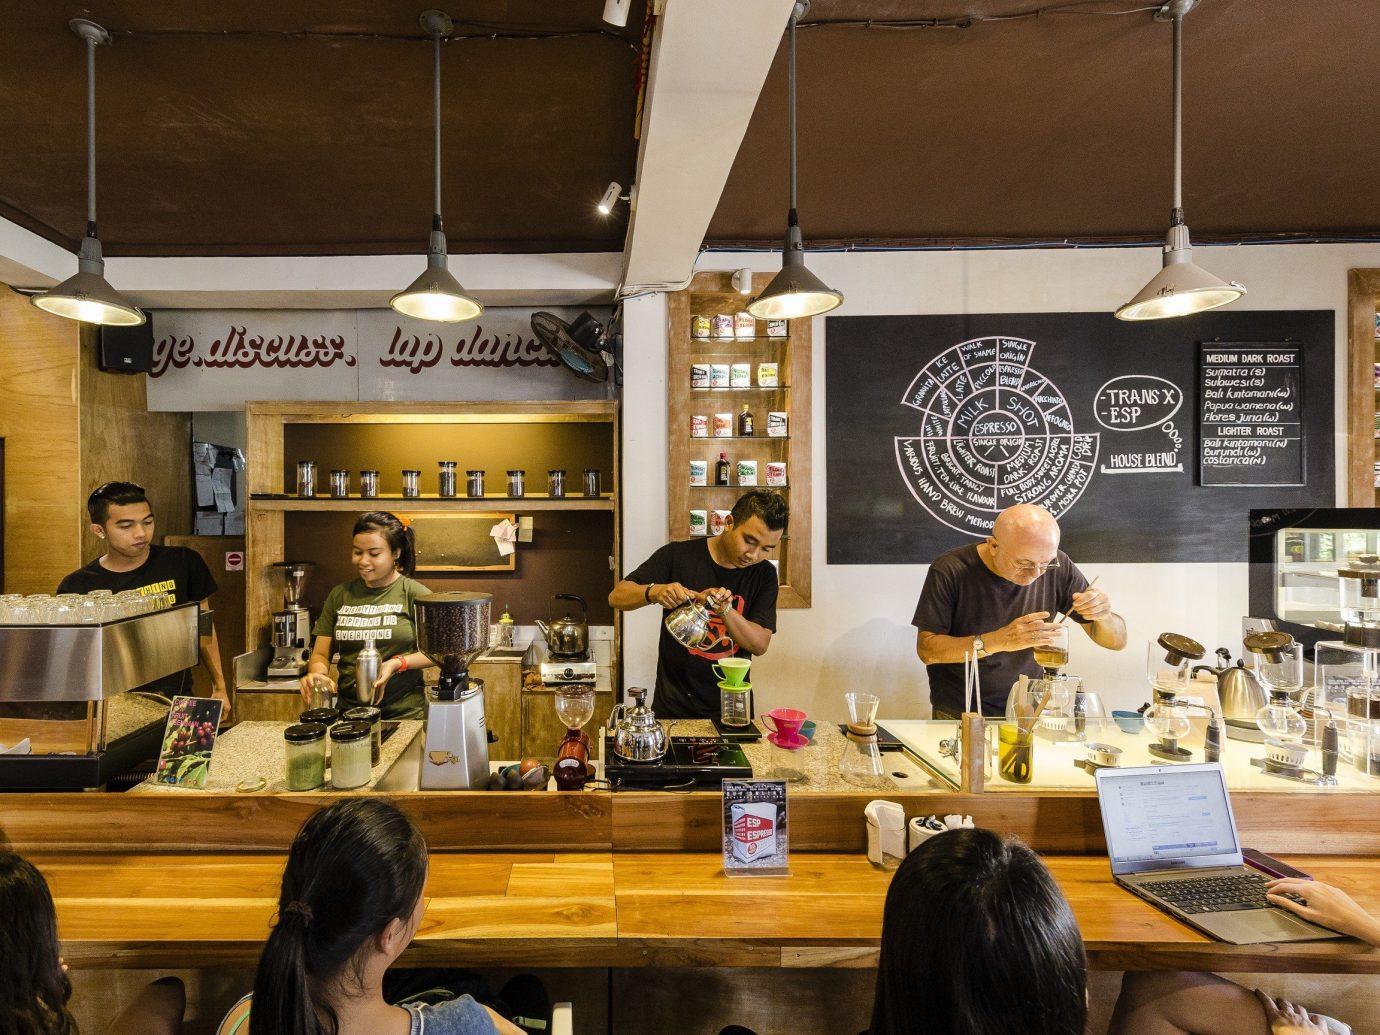 Food + Drink indoor person ceiling restaurant coffeehouse interior design café food cuisine